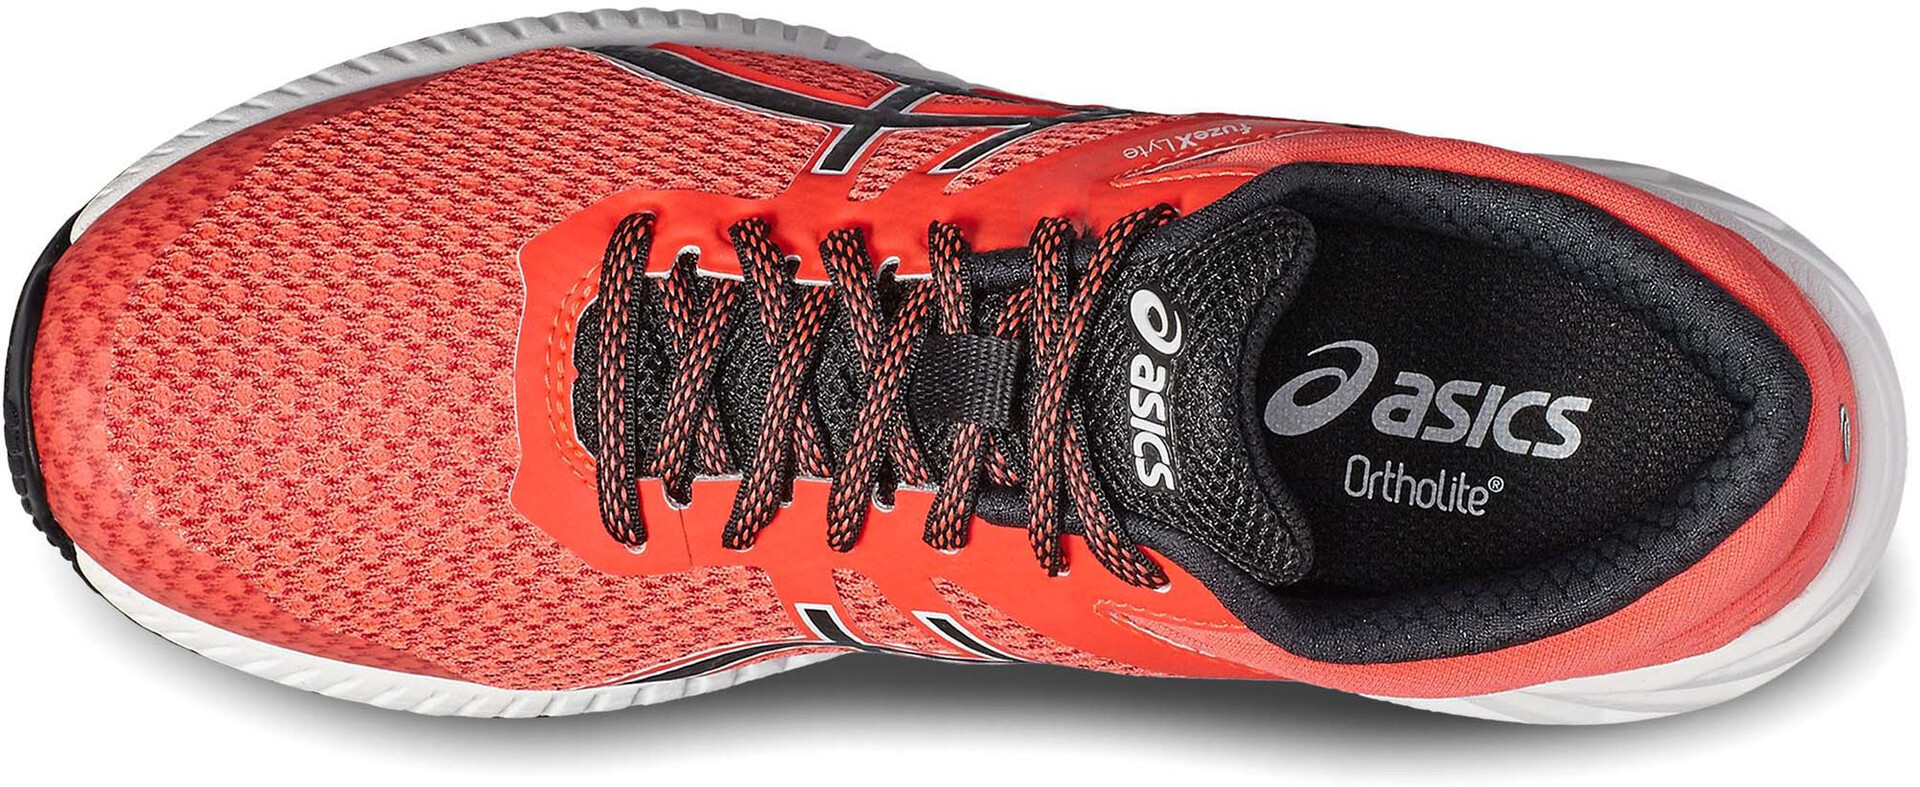 Boutique Asics Fuzex Femme De Chaussures 2 Rose Lyte Running rqxBq0wP6